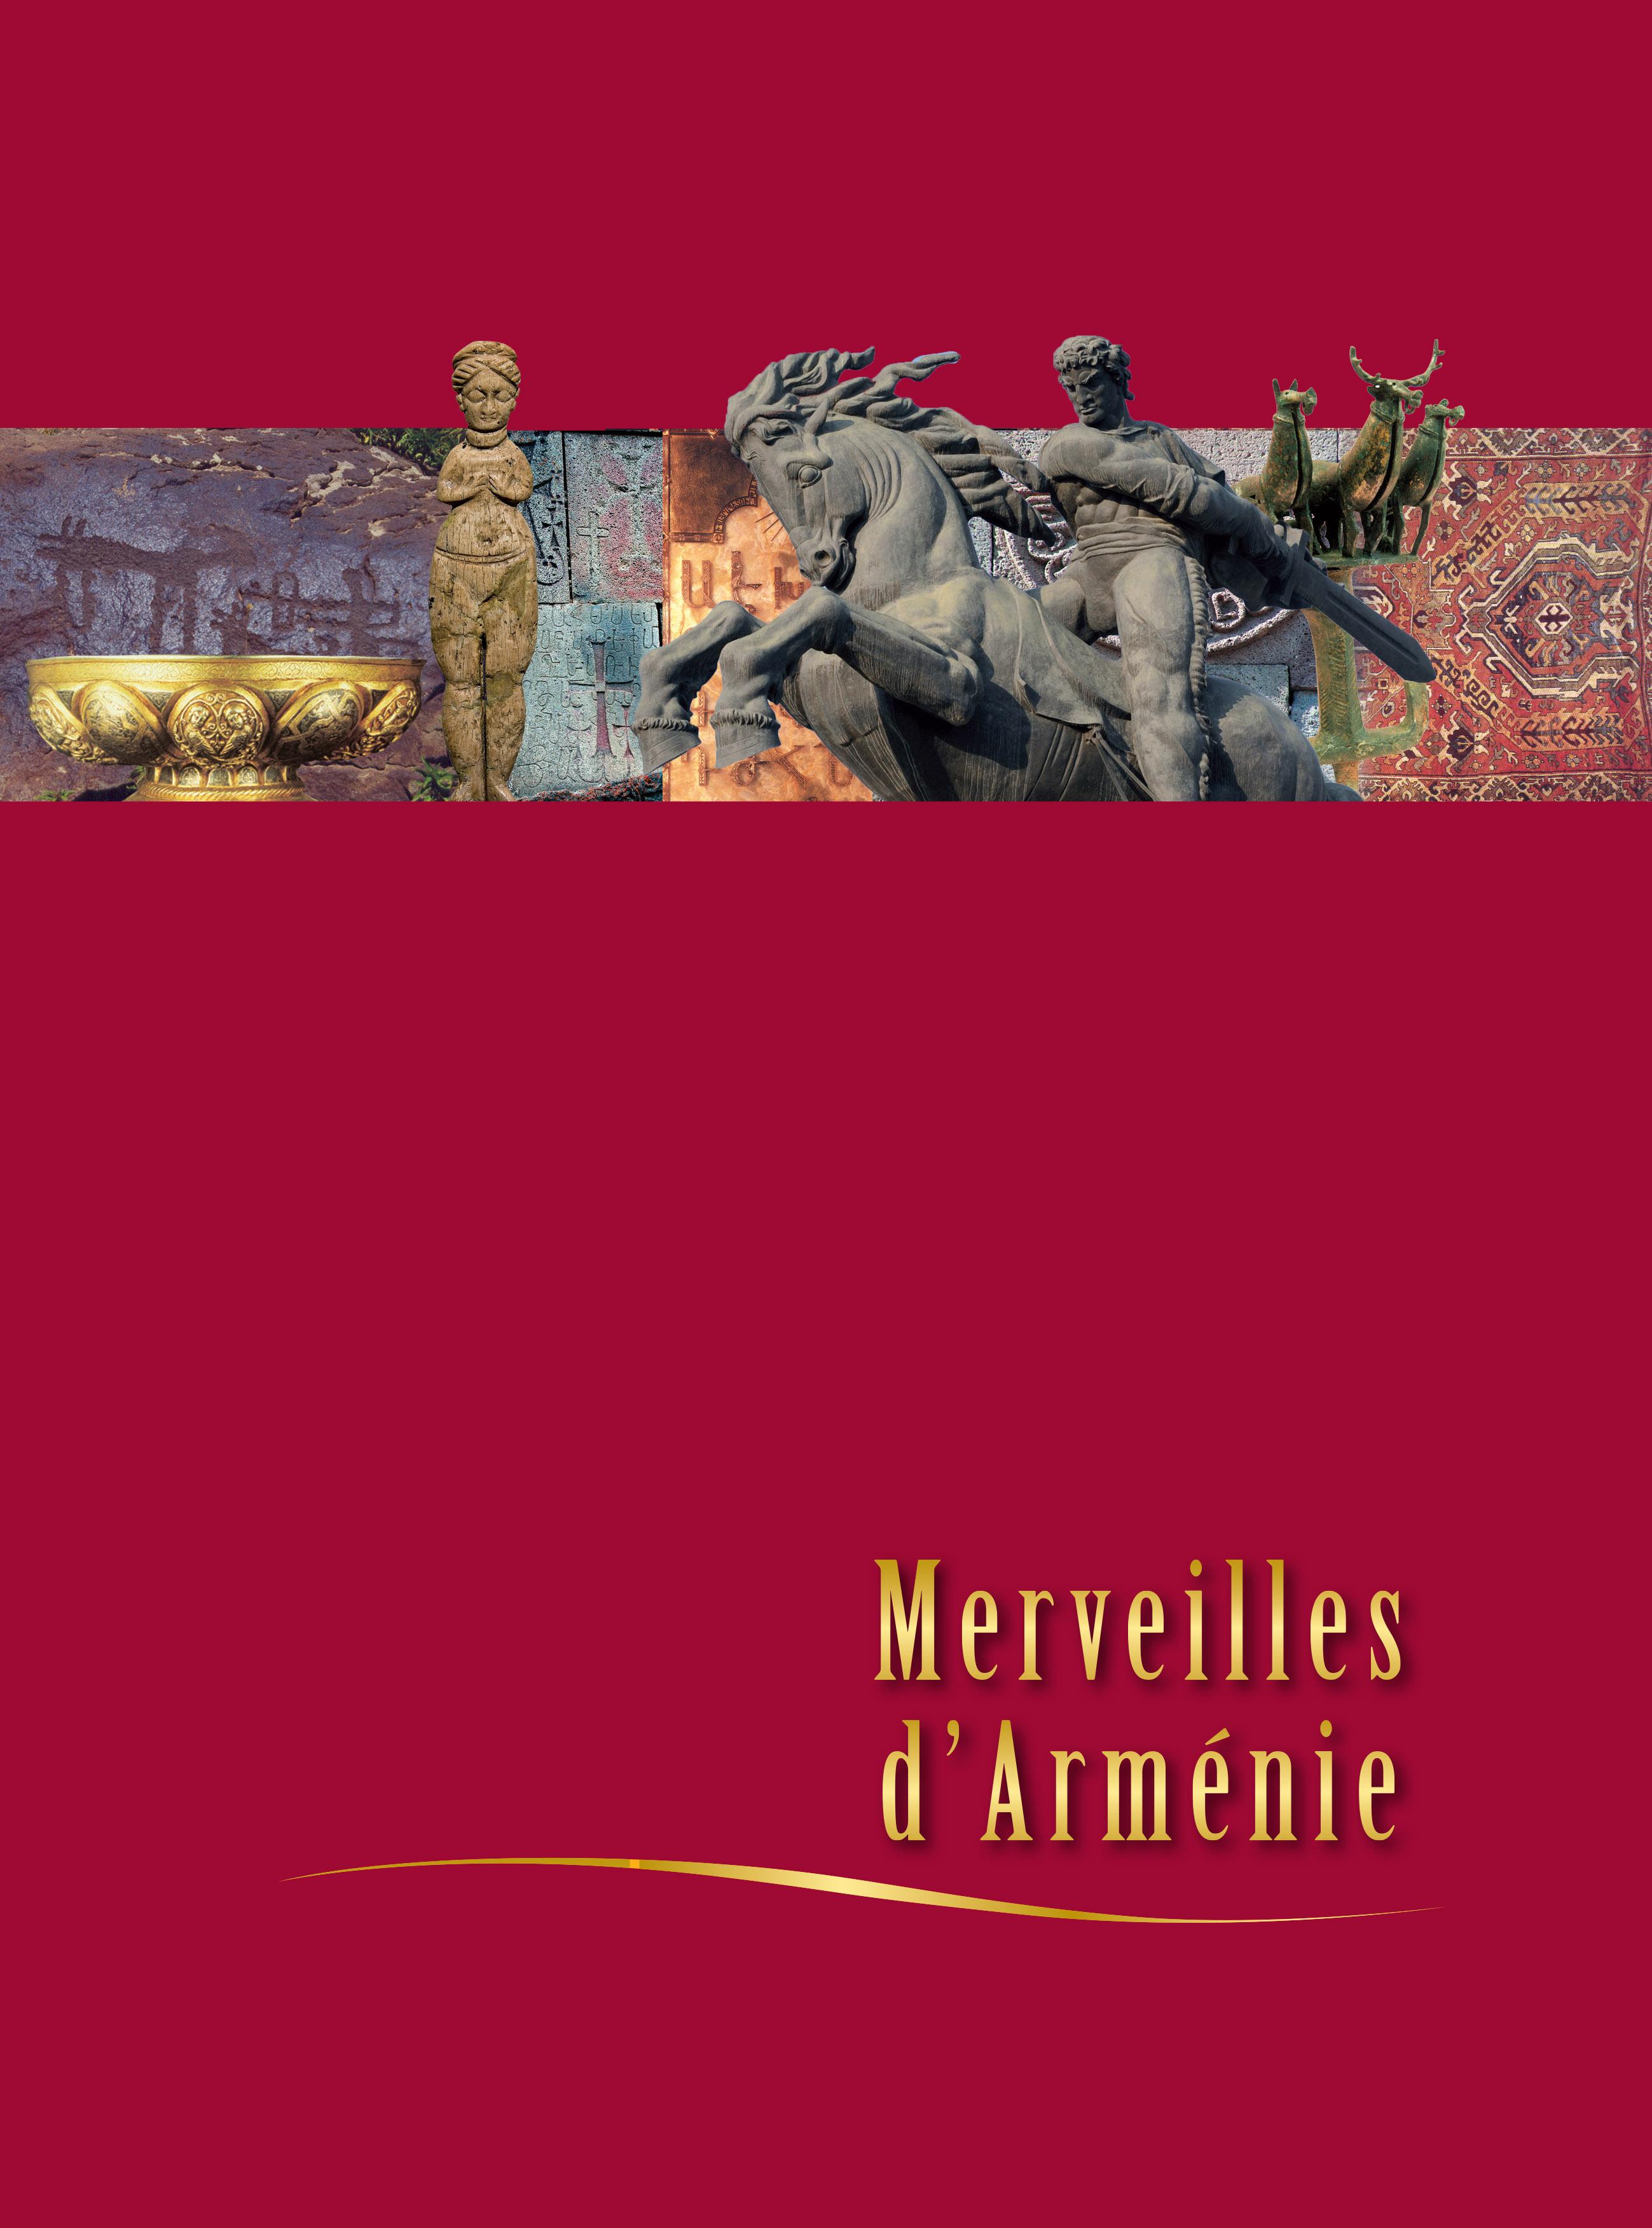 MERVEILLES D'ARMENIE - NLLE ED. AUGMENTEE